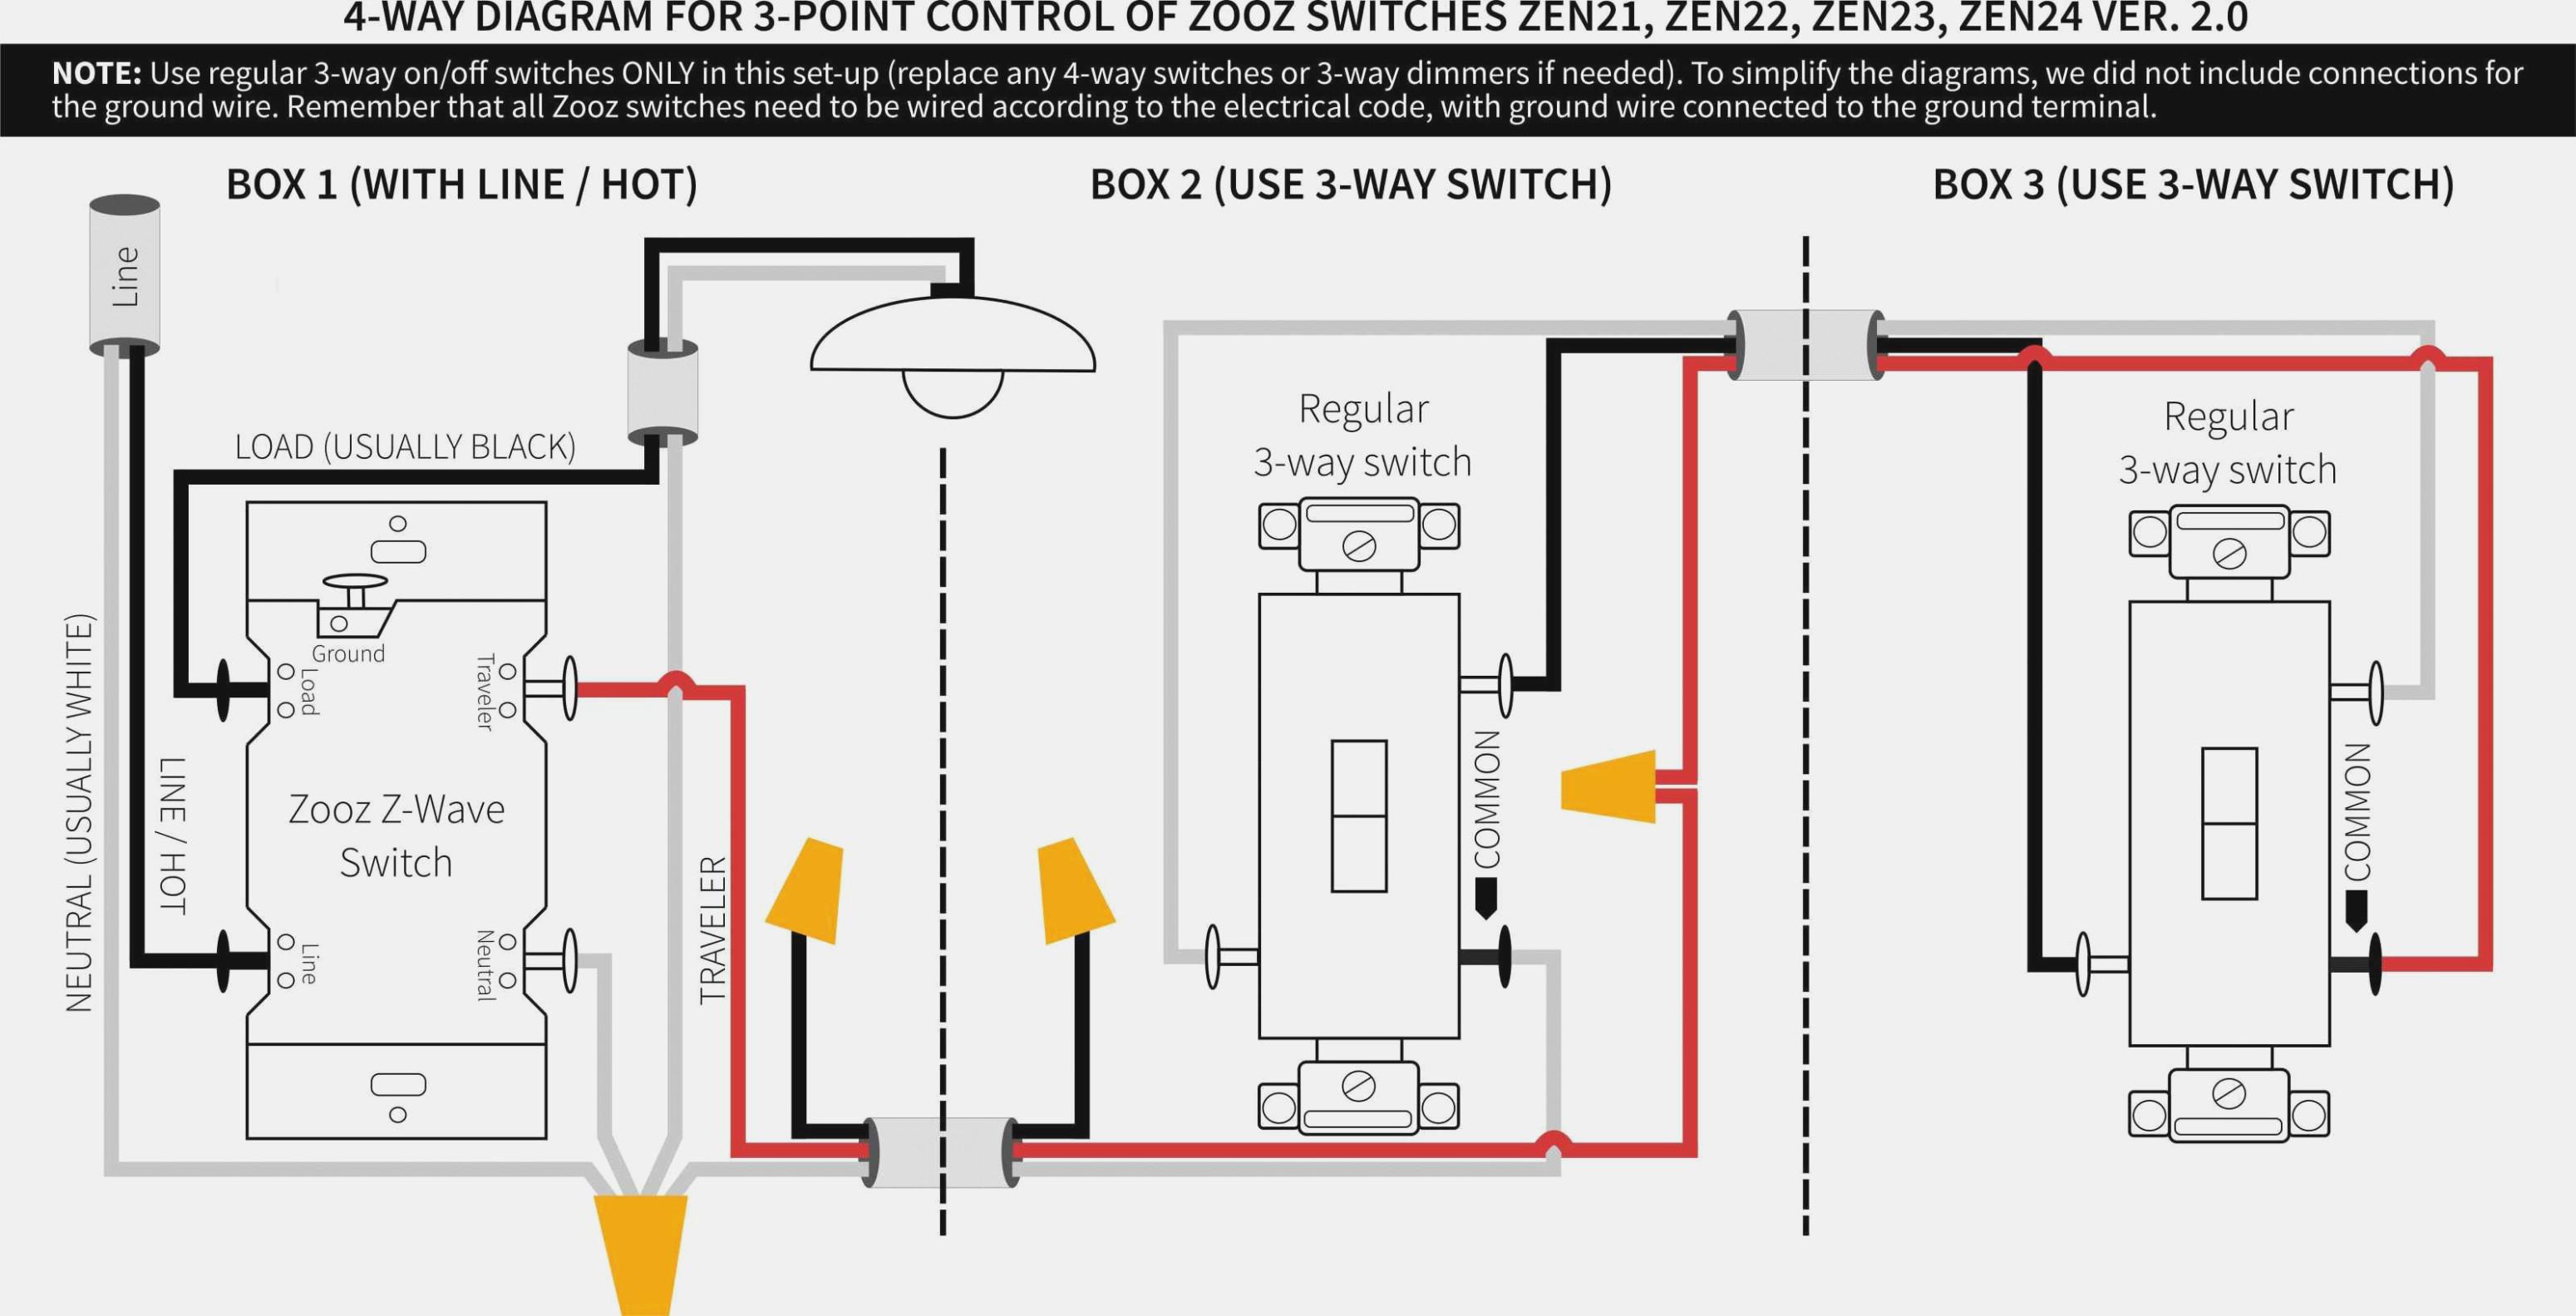 Lutron Three Way Dimmer Switch Wiring Diagram | Wiring Library - 3 Way Dimmer Switches Wiring Diagram